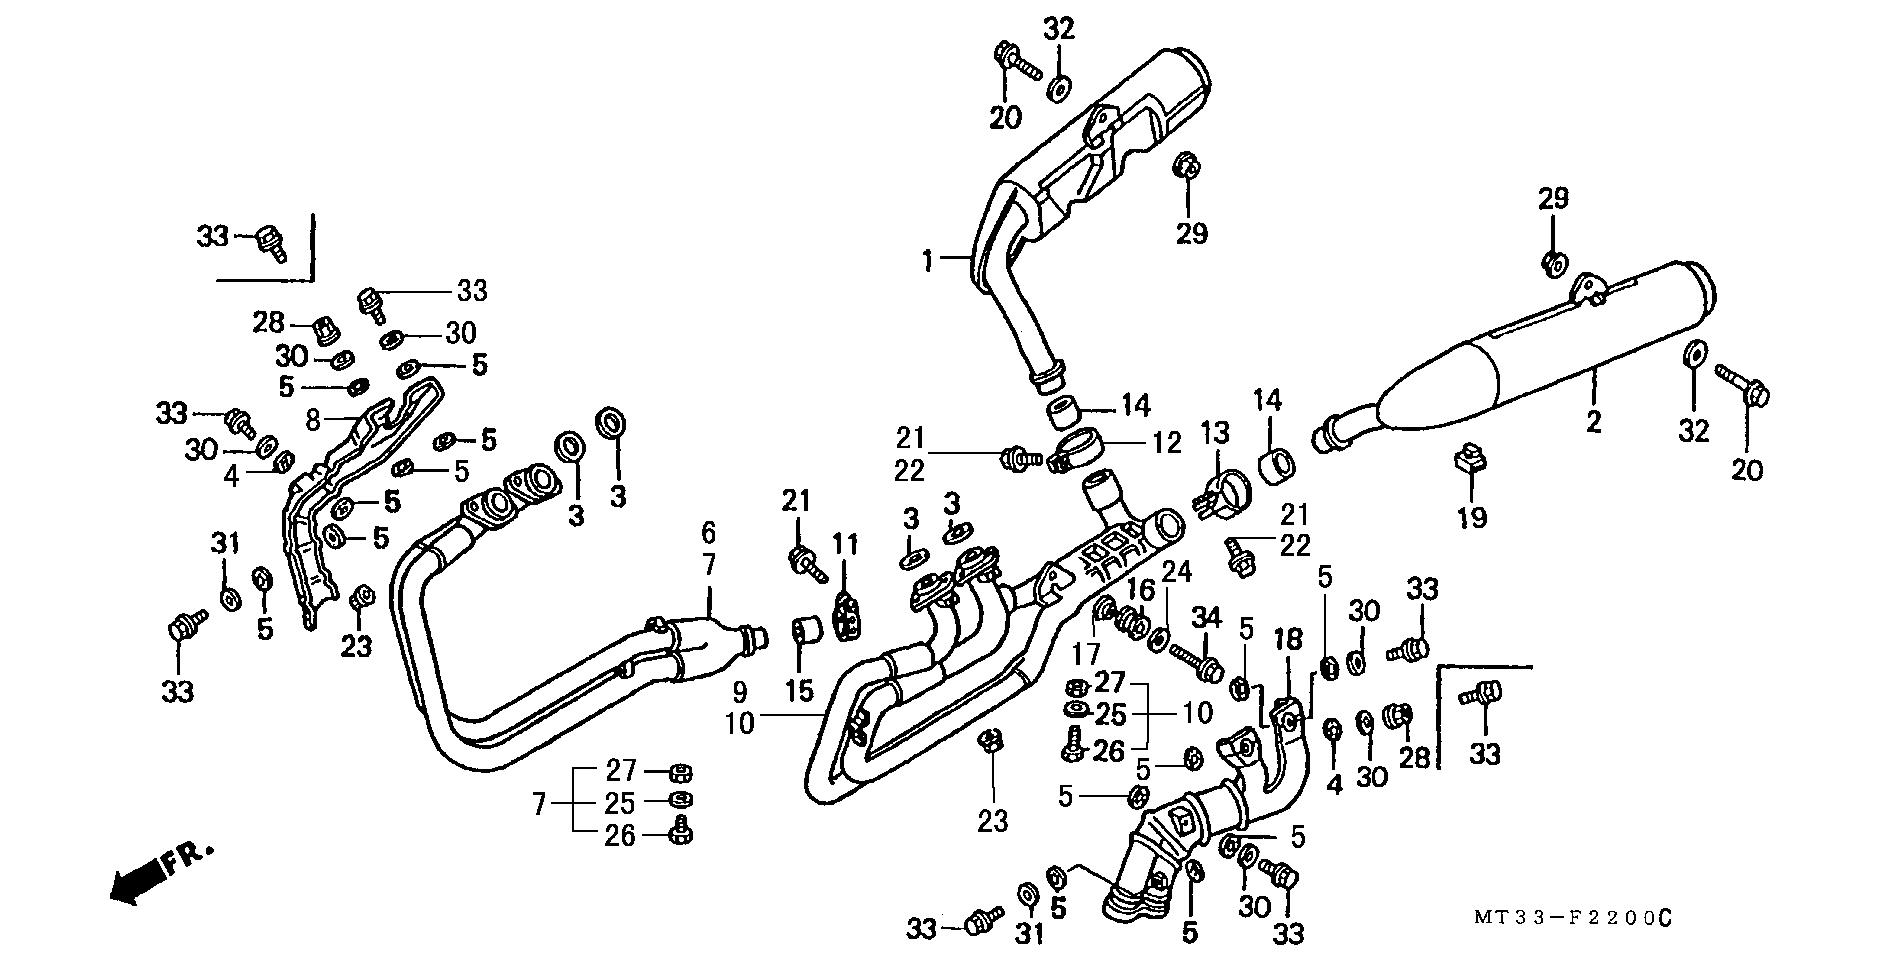 Colector derecho Honda Pan european 1100 1990-2000